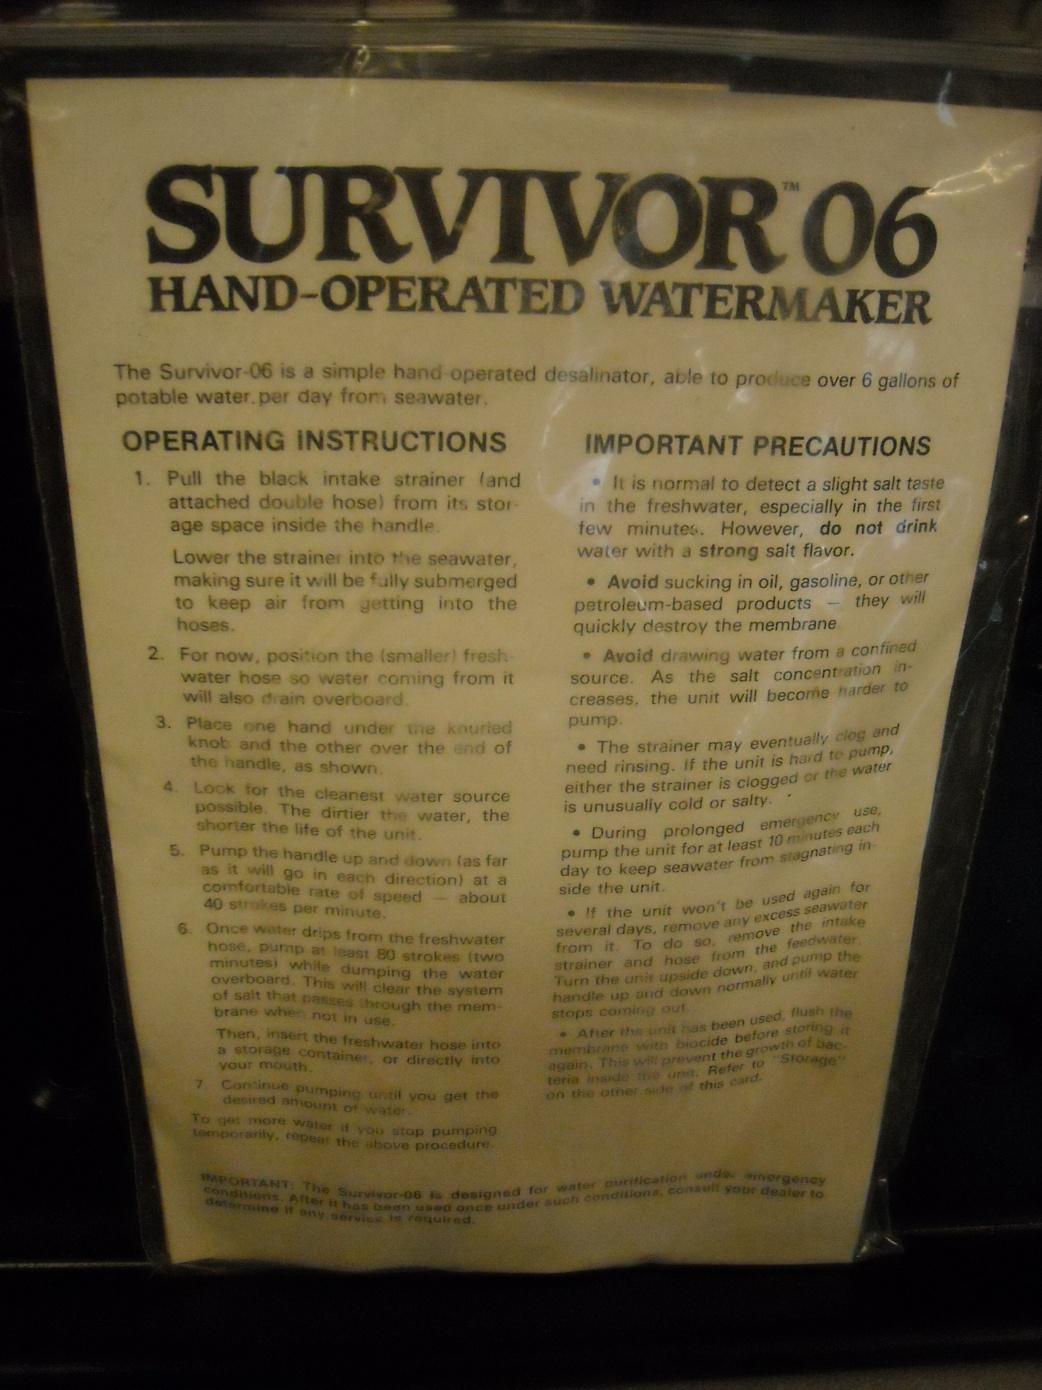 Click image for larger version  Name:Watermaker Survivor 06 006.jpg Views:68 Size:413.5 KB ID:48116